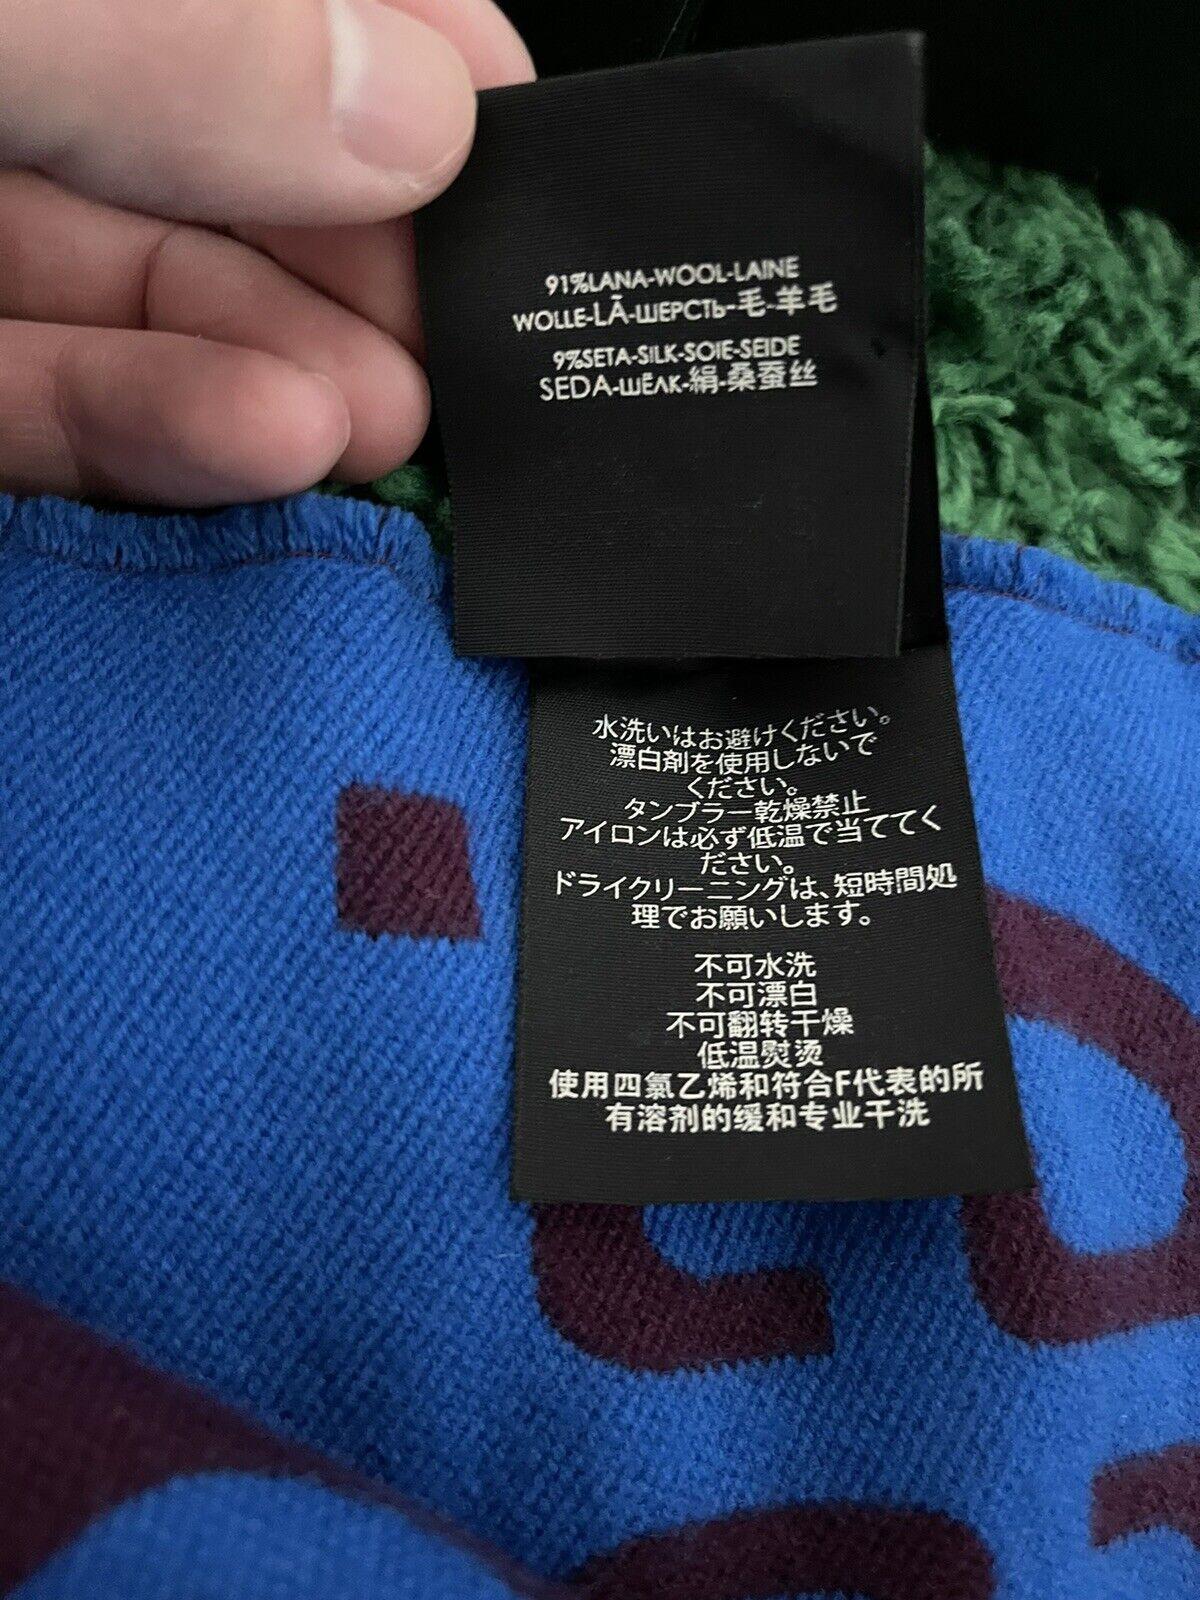 Gucci GG jacquard wool silk scarf - image 4